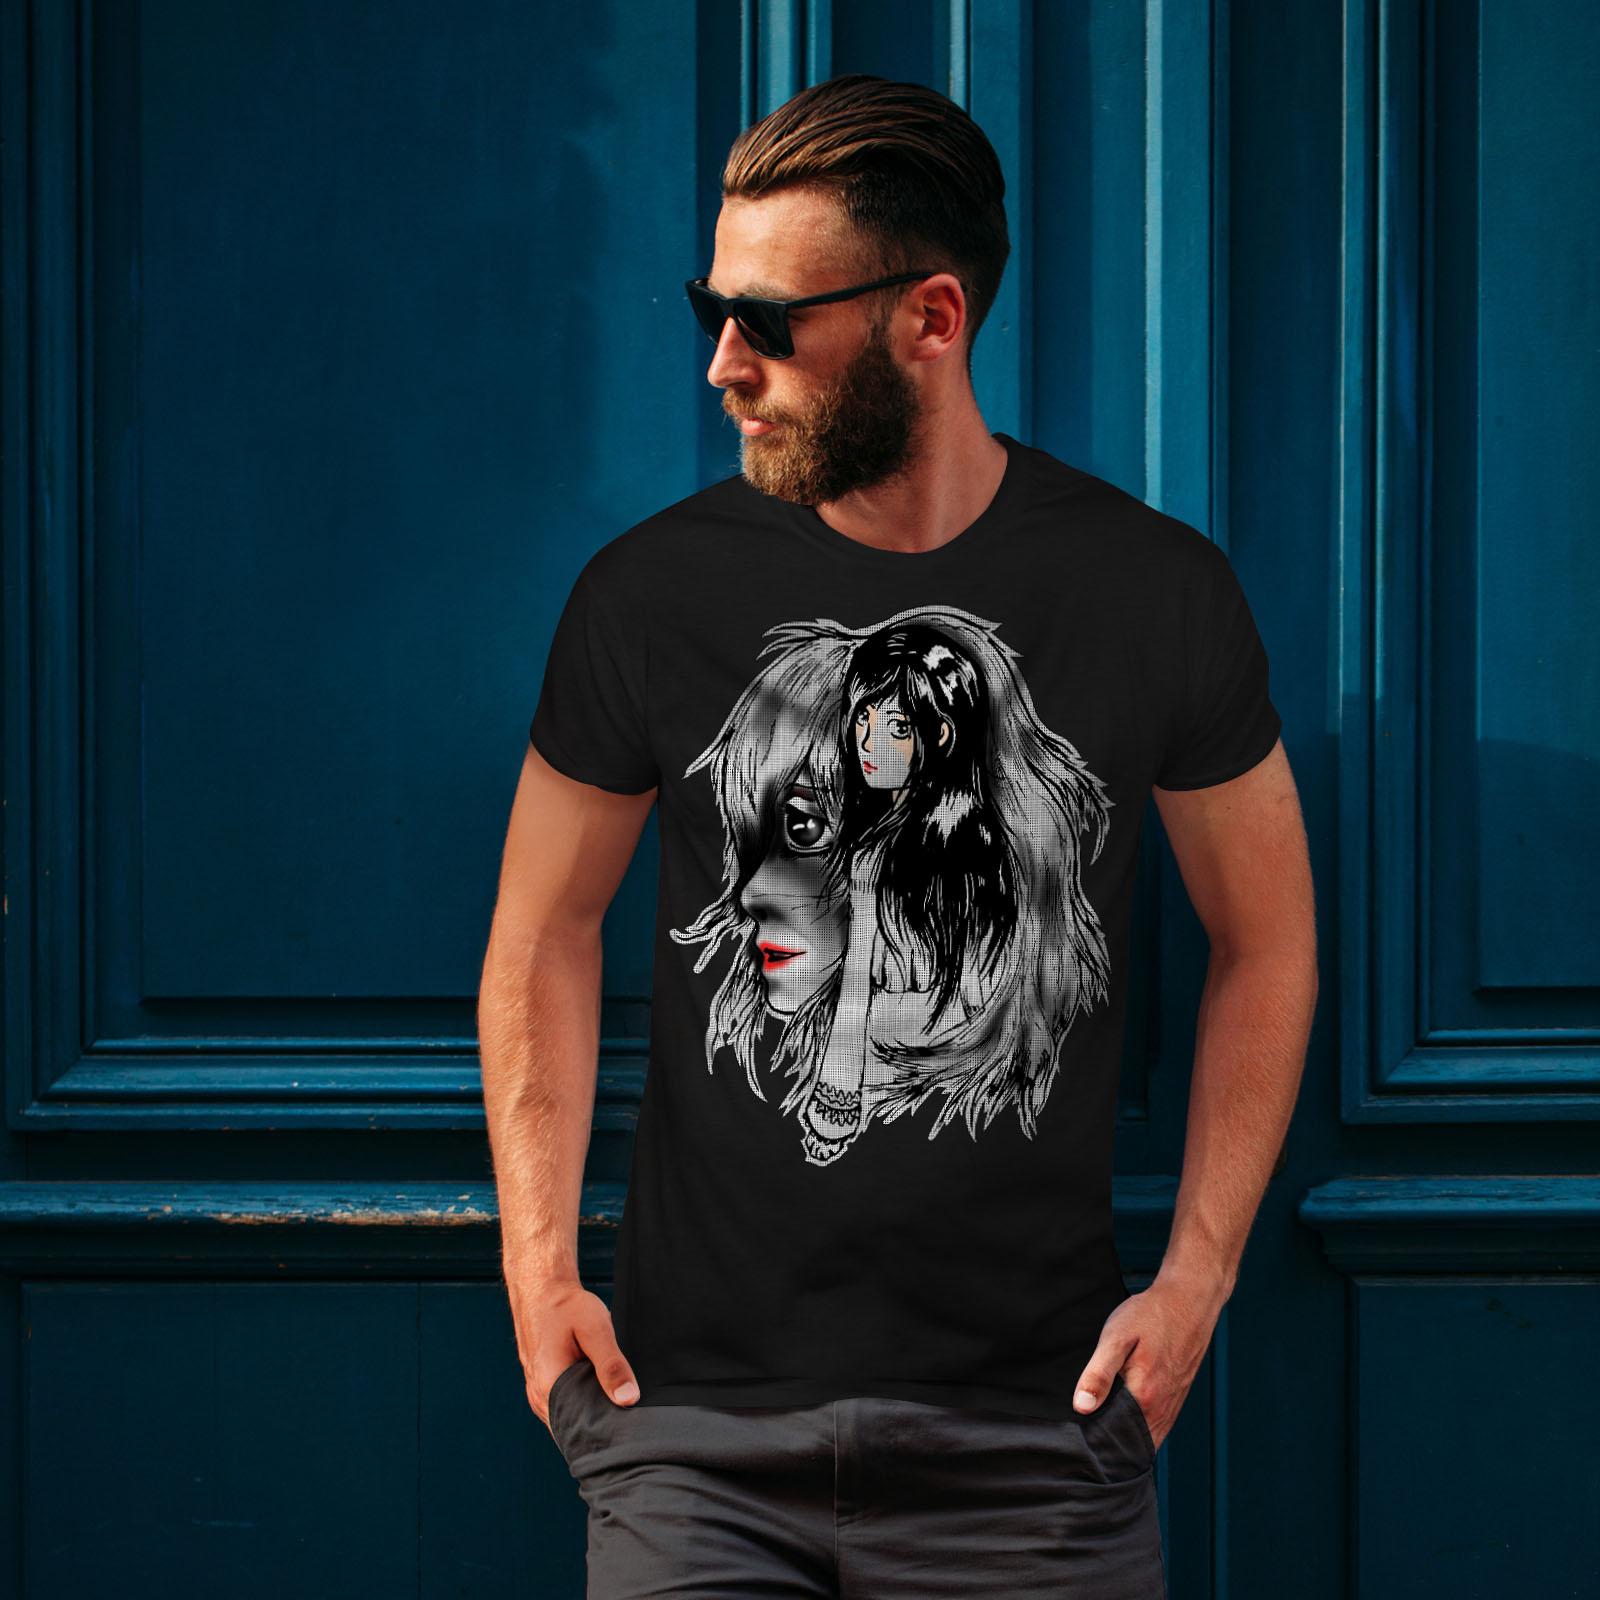 Wellcoda-bellissime-ANIME-Da-Uomo-T-shirt-misterioso-design-grafico-stampato-T-shirt miniatura 4